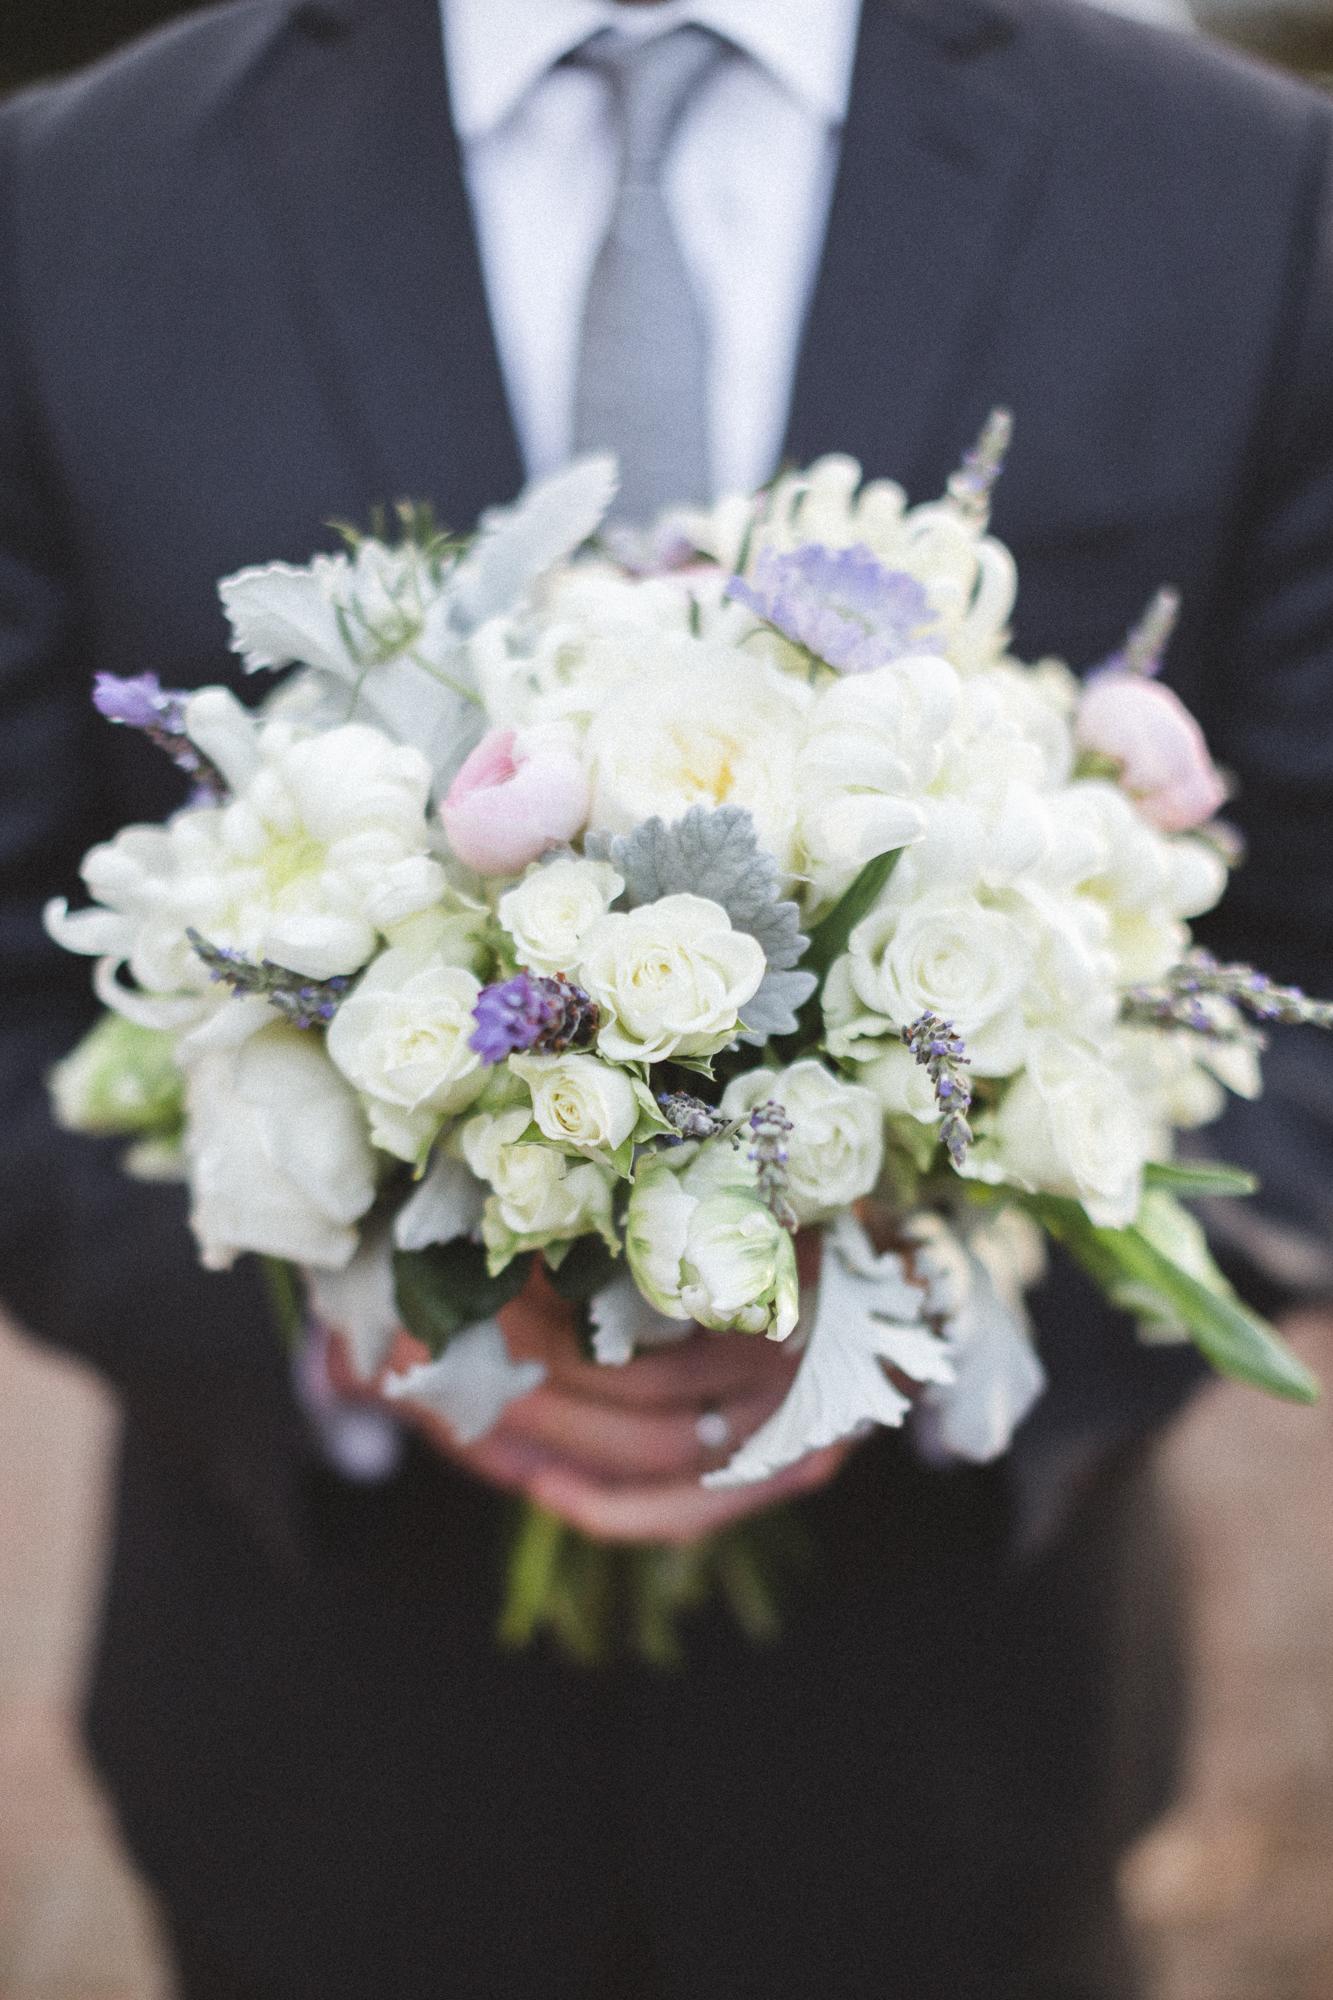 Granville Inn Wedding Photos - Columbus Ohio Wedding - Steve + Jen - DiBlasio Photo-206.jpg